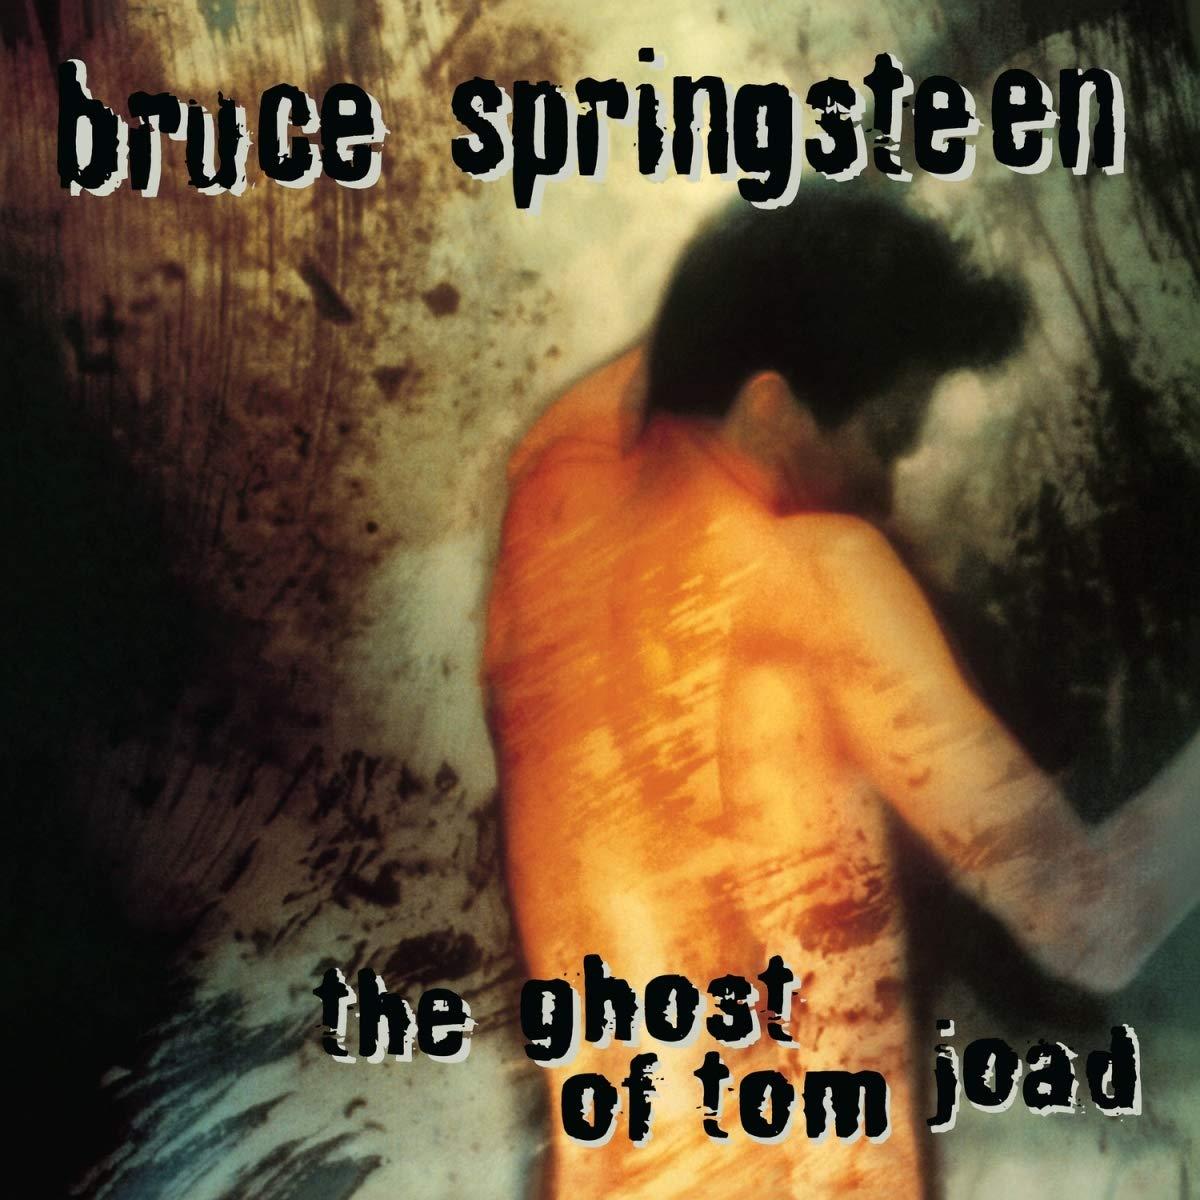 Bruce Springsteen – The Ghost Of Tom Joad (LP) -17% reduziert